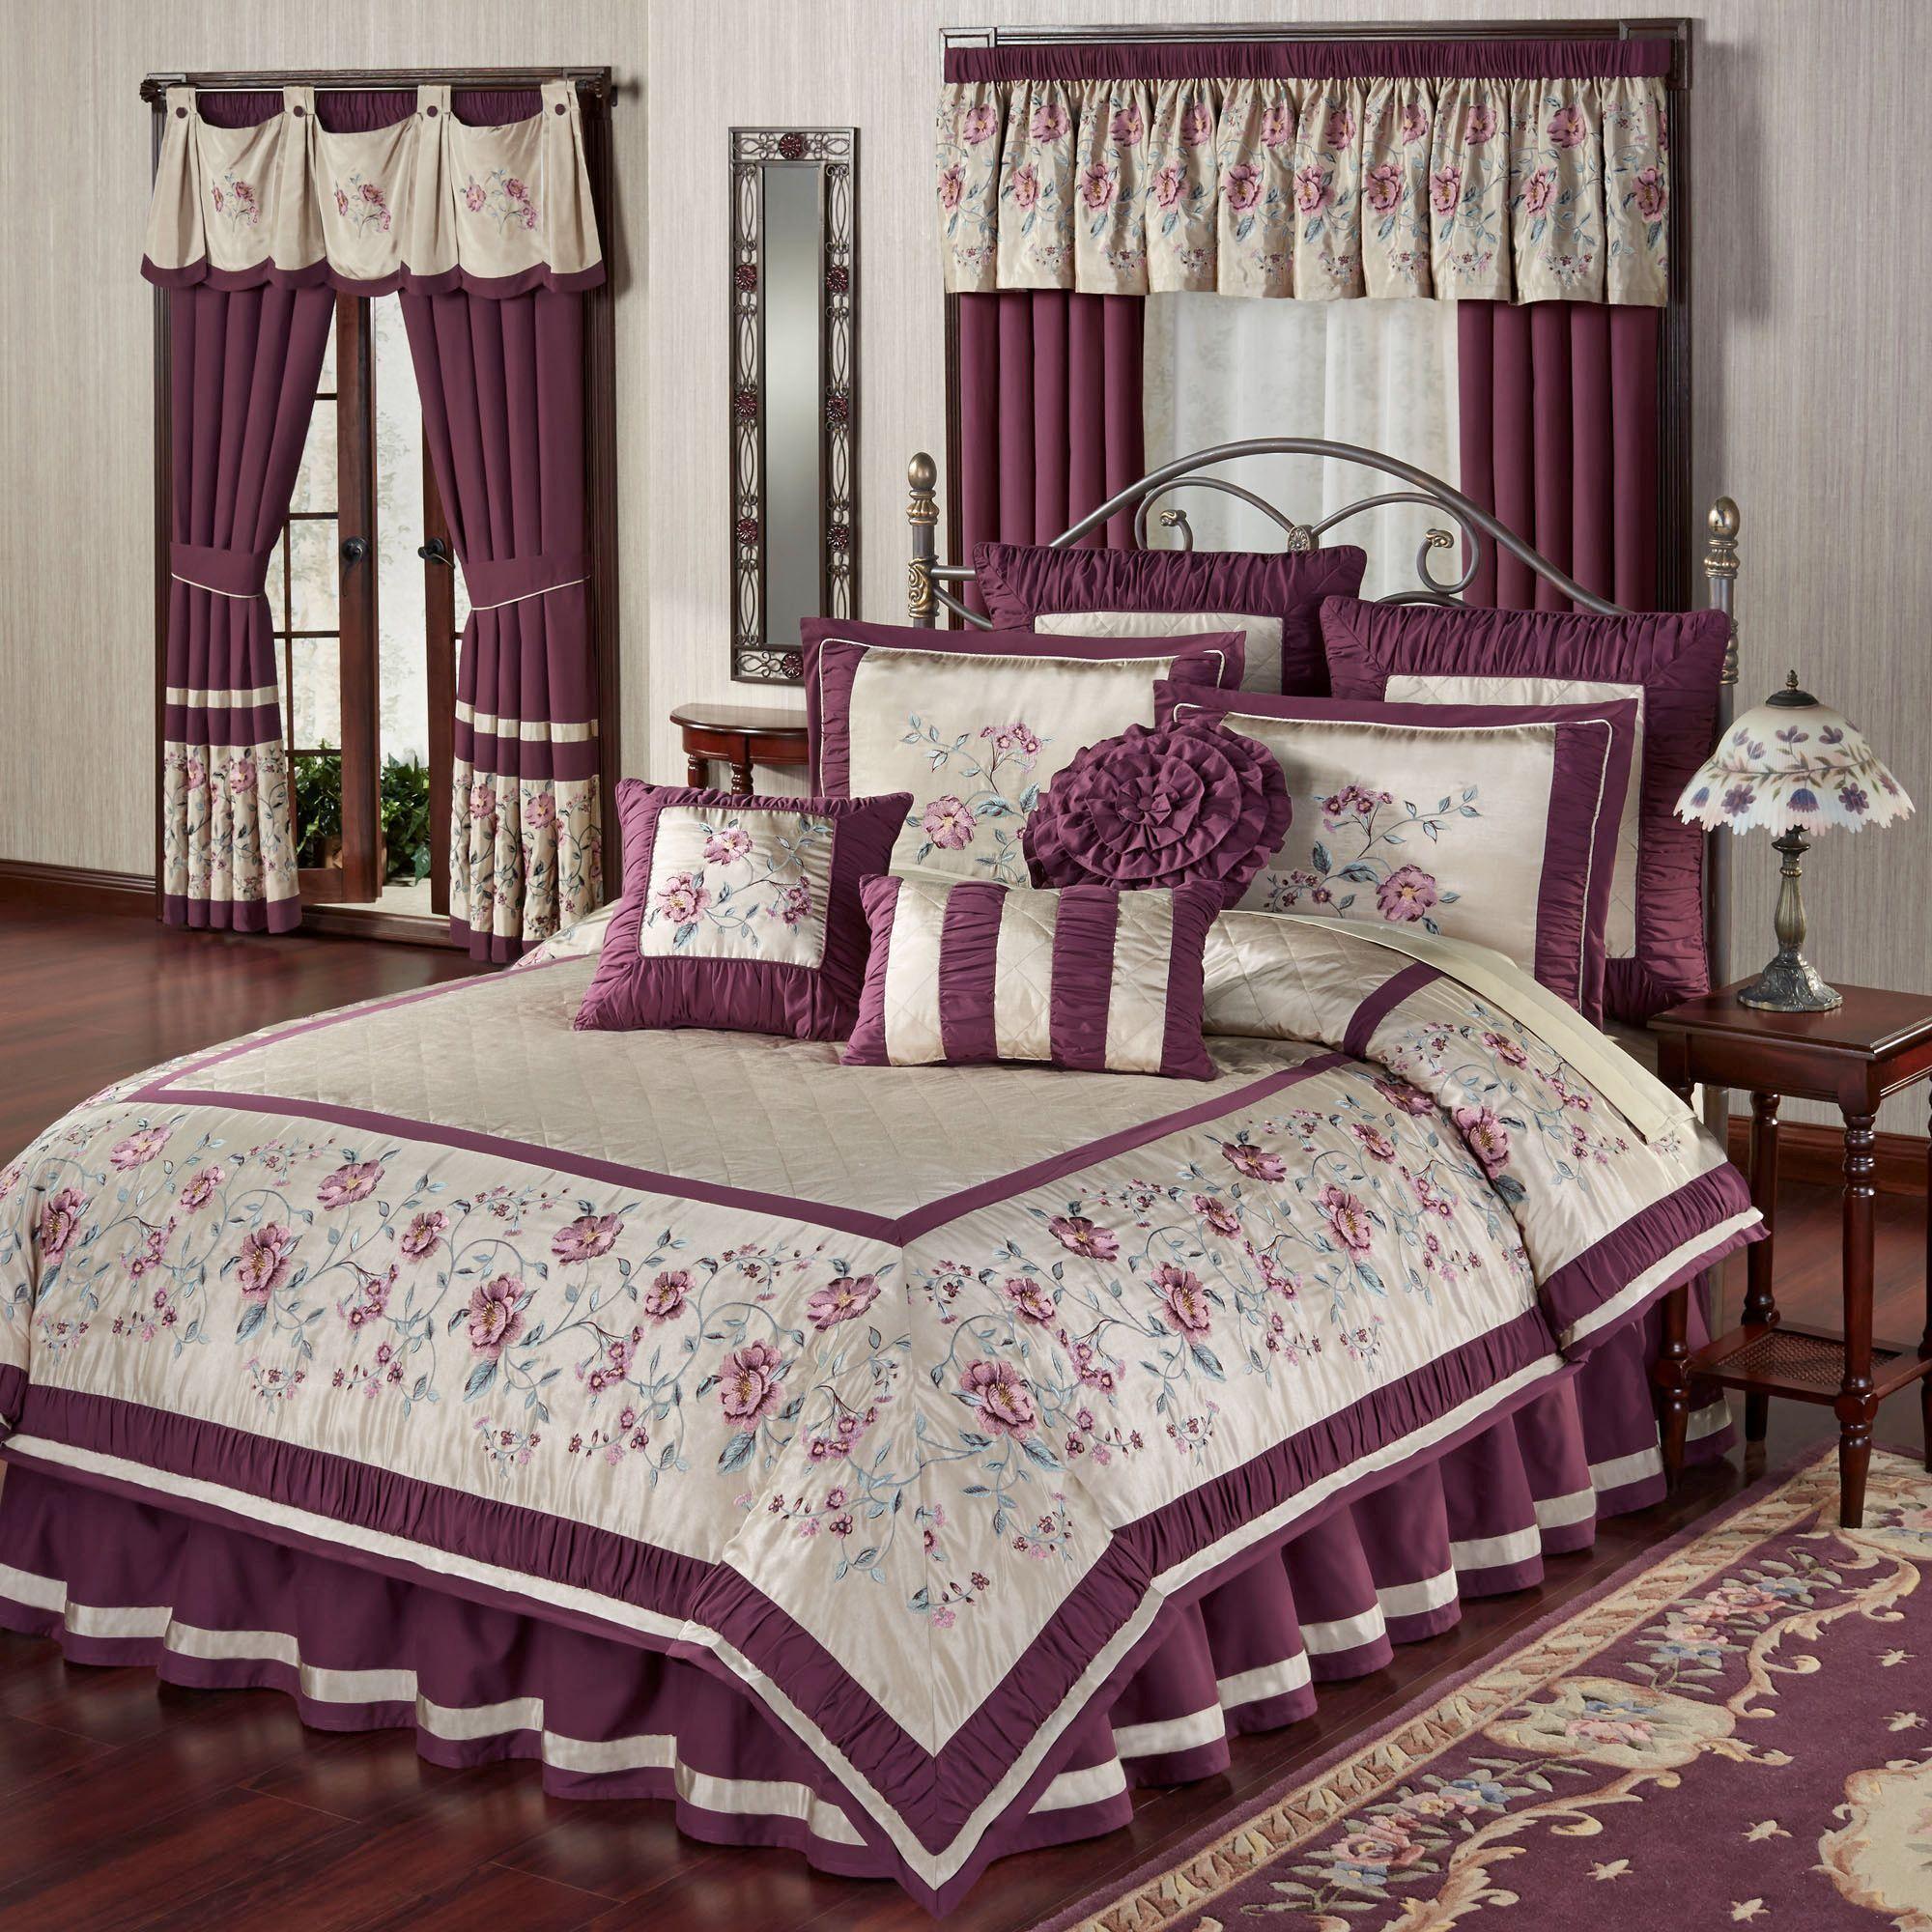 Mystic Garden Floral Comforter Bedding